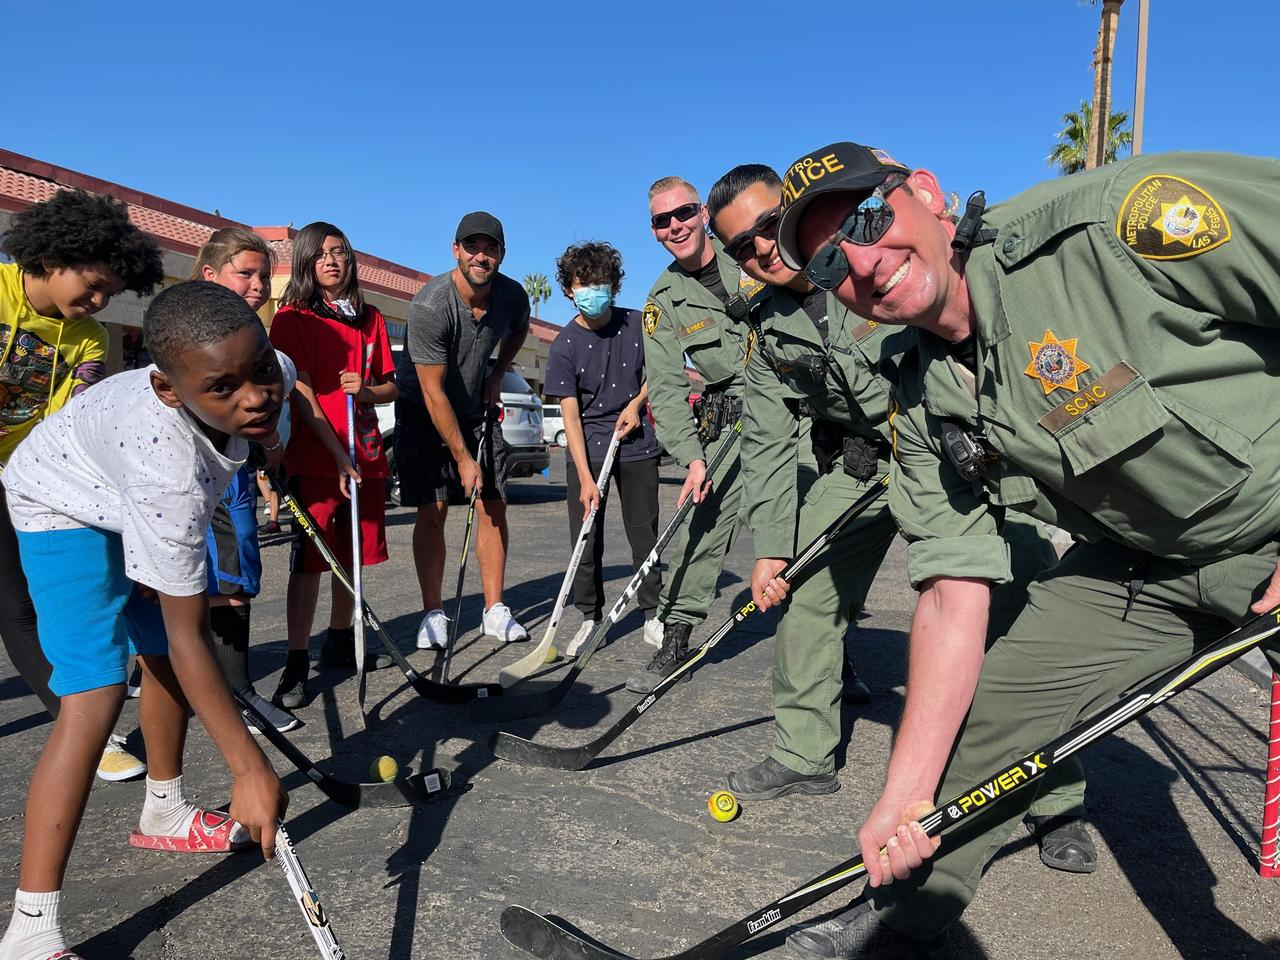 Retired Vegas Golden Knights player Deryk Engelland joined kids' street hockey game